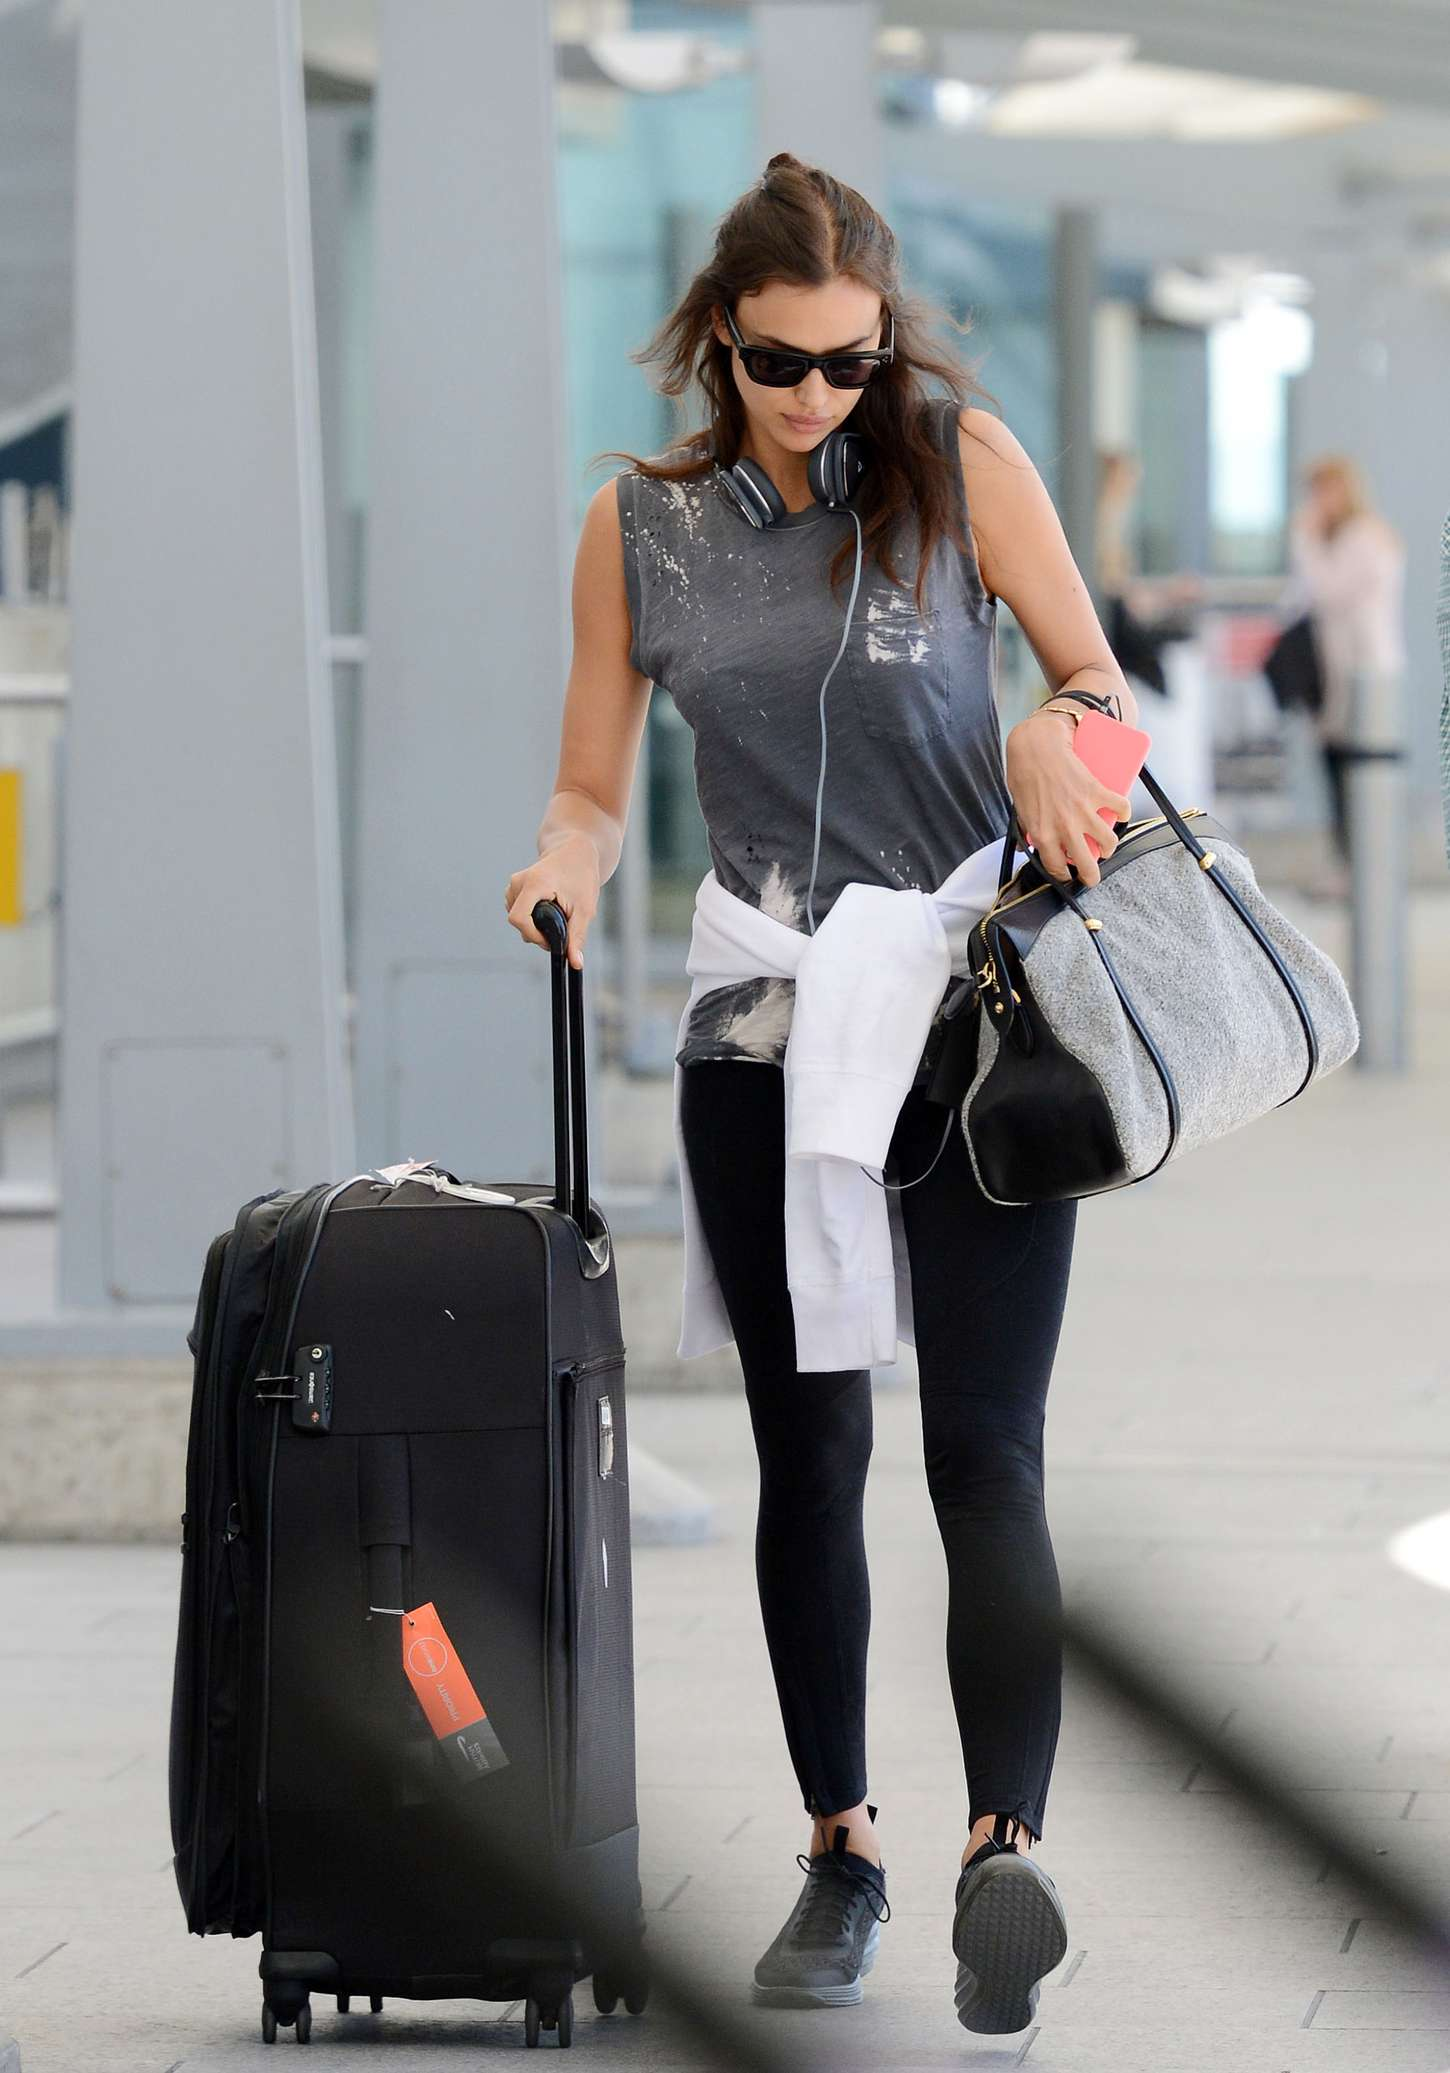 Irina Shayk 2015 : Irina Shayk in Leggings at Heathrow airport -01